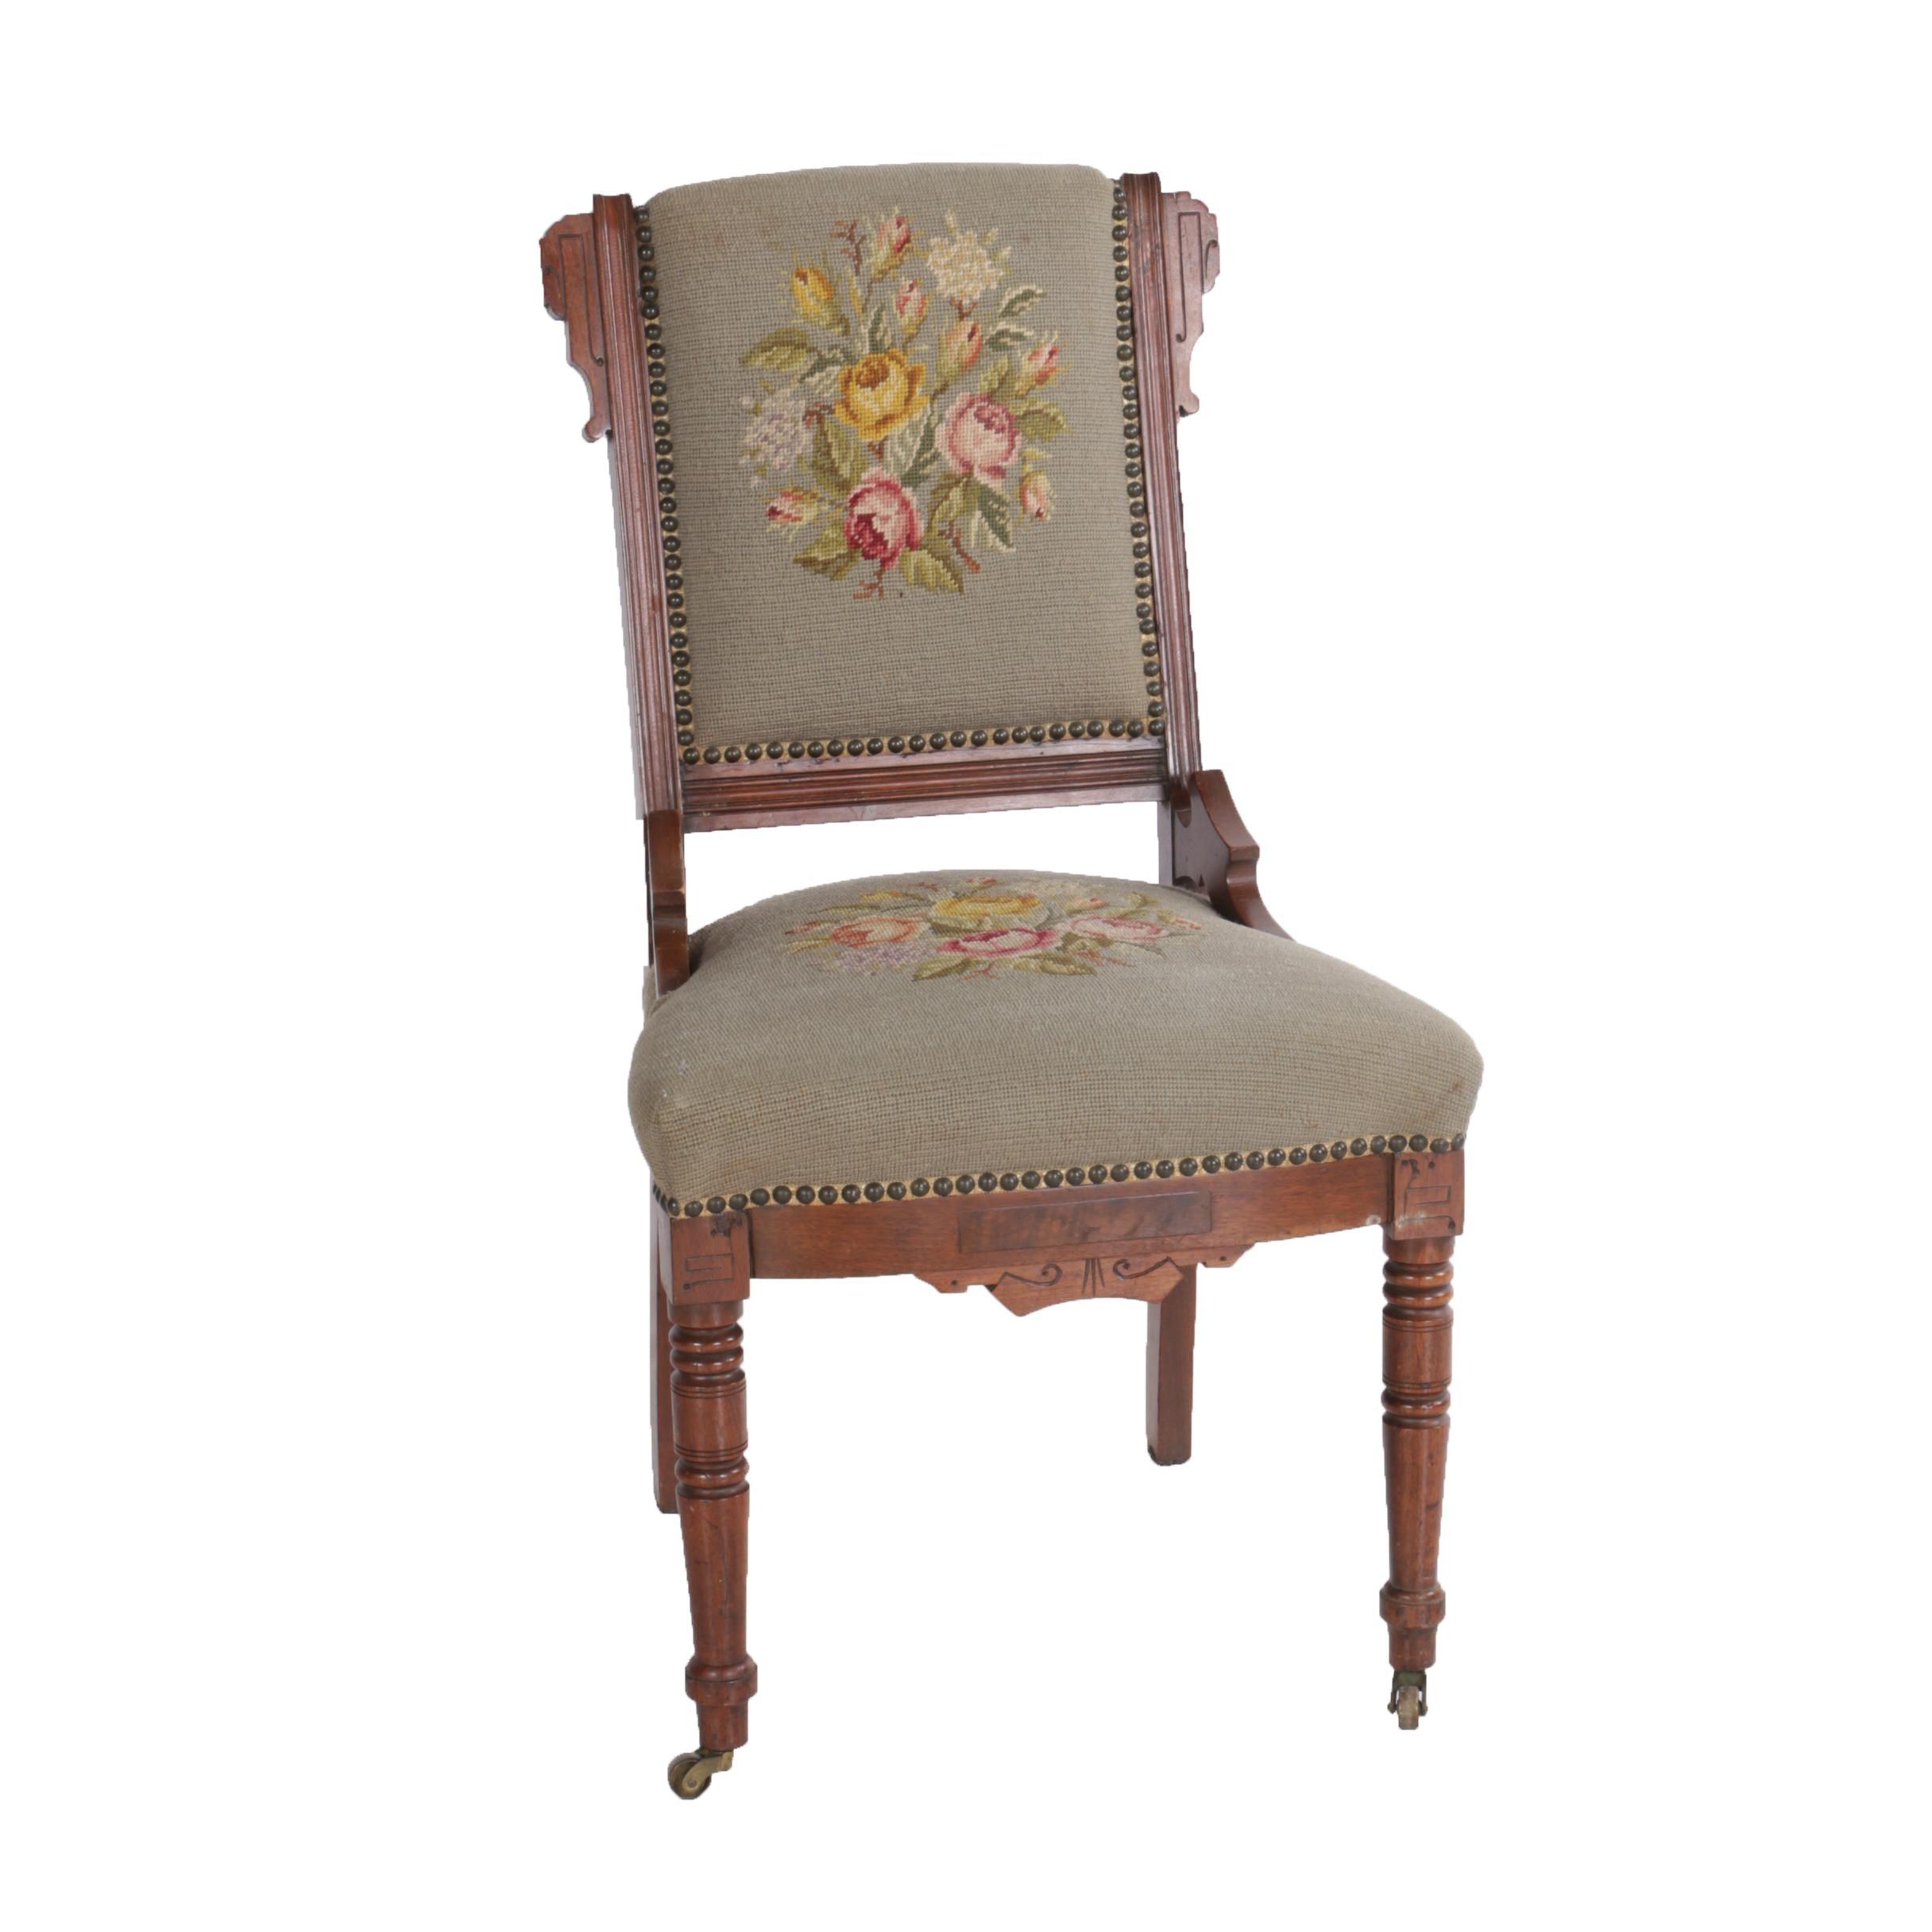 Antique Victorian Eastlake Walnut Needlepoint Chair